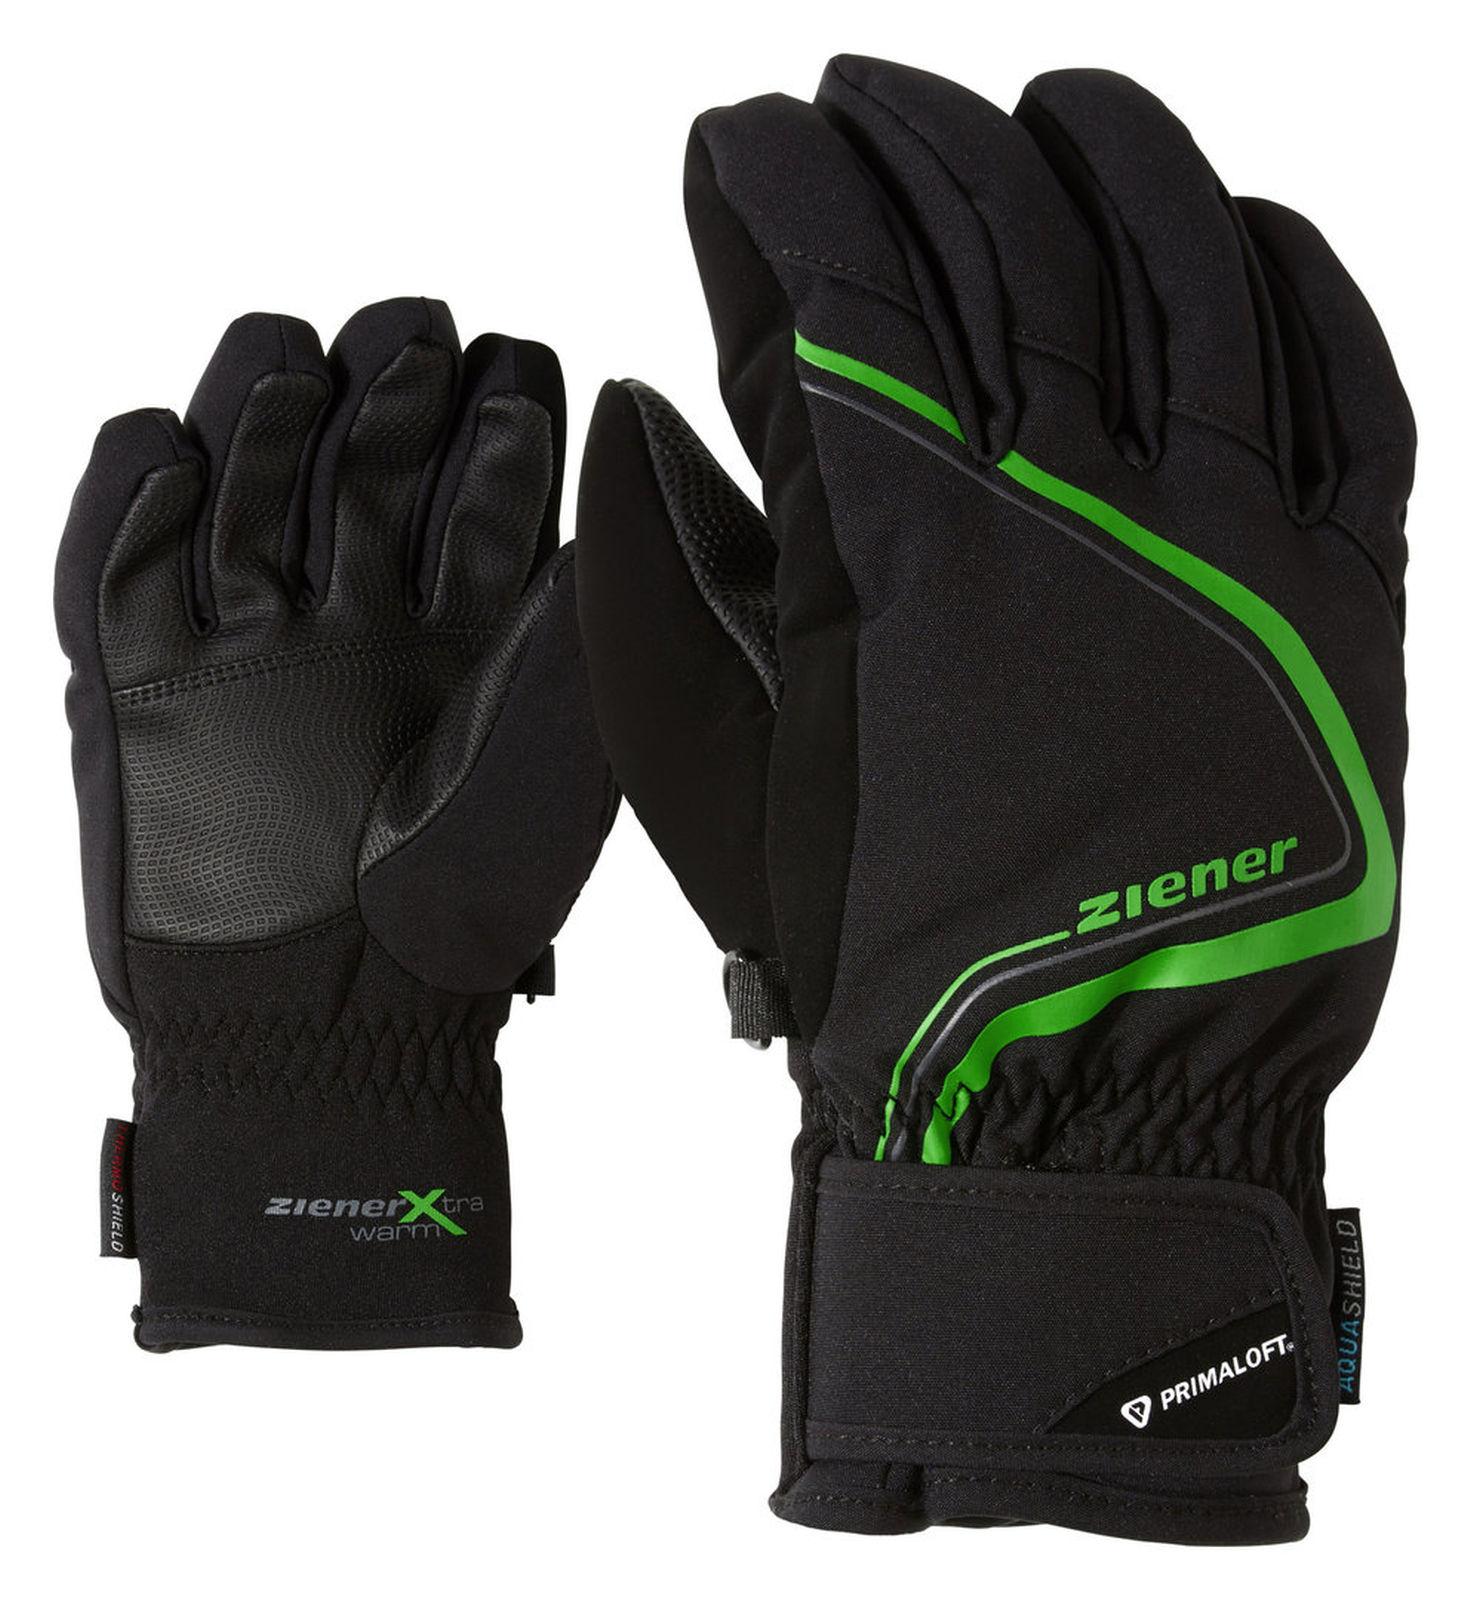 Ziener Kinder Handschuh LANU AS PRIMALOFT JUNIOR schwarz grün 181903 12785